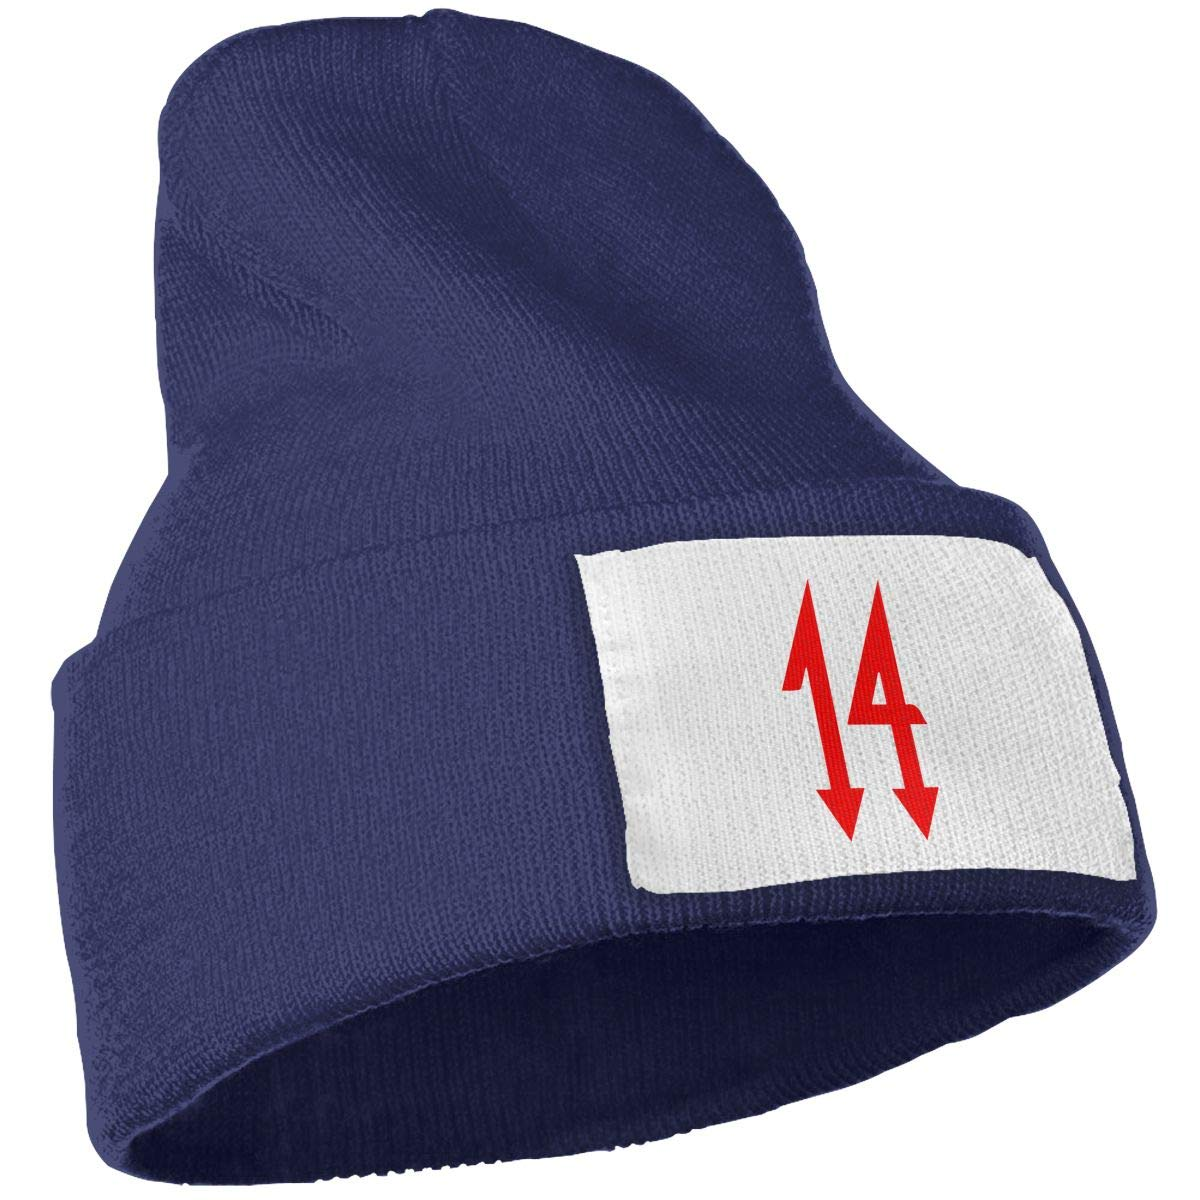 Unisex Winter Hats Trippie Redd 14 Skull Caps Knit Hat Cap Beanie Cap for Men//Womens